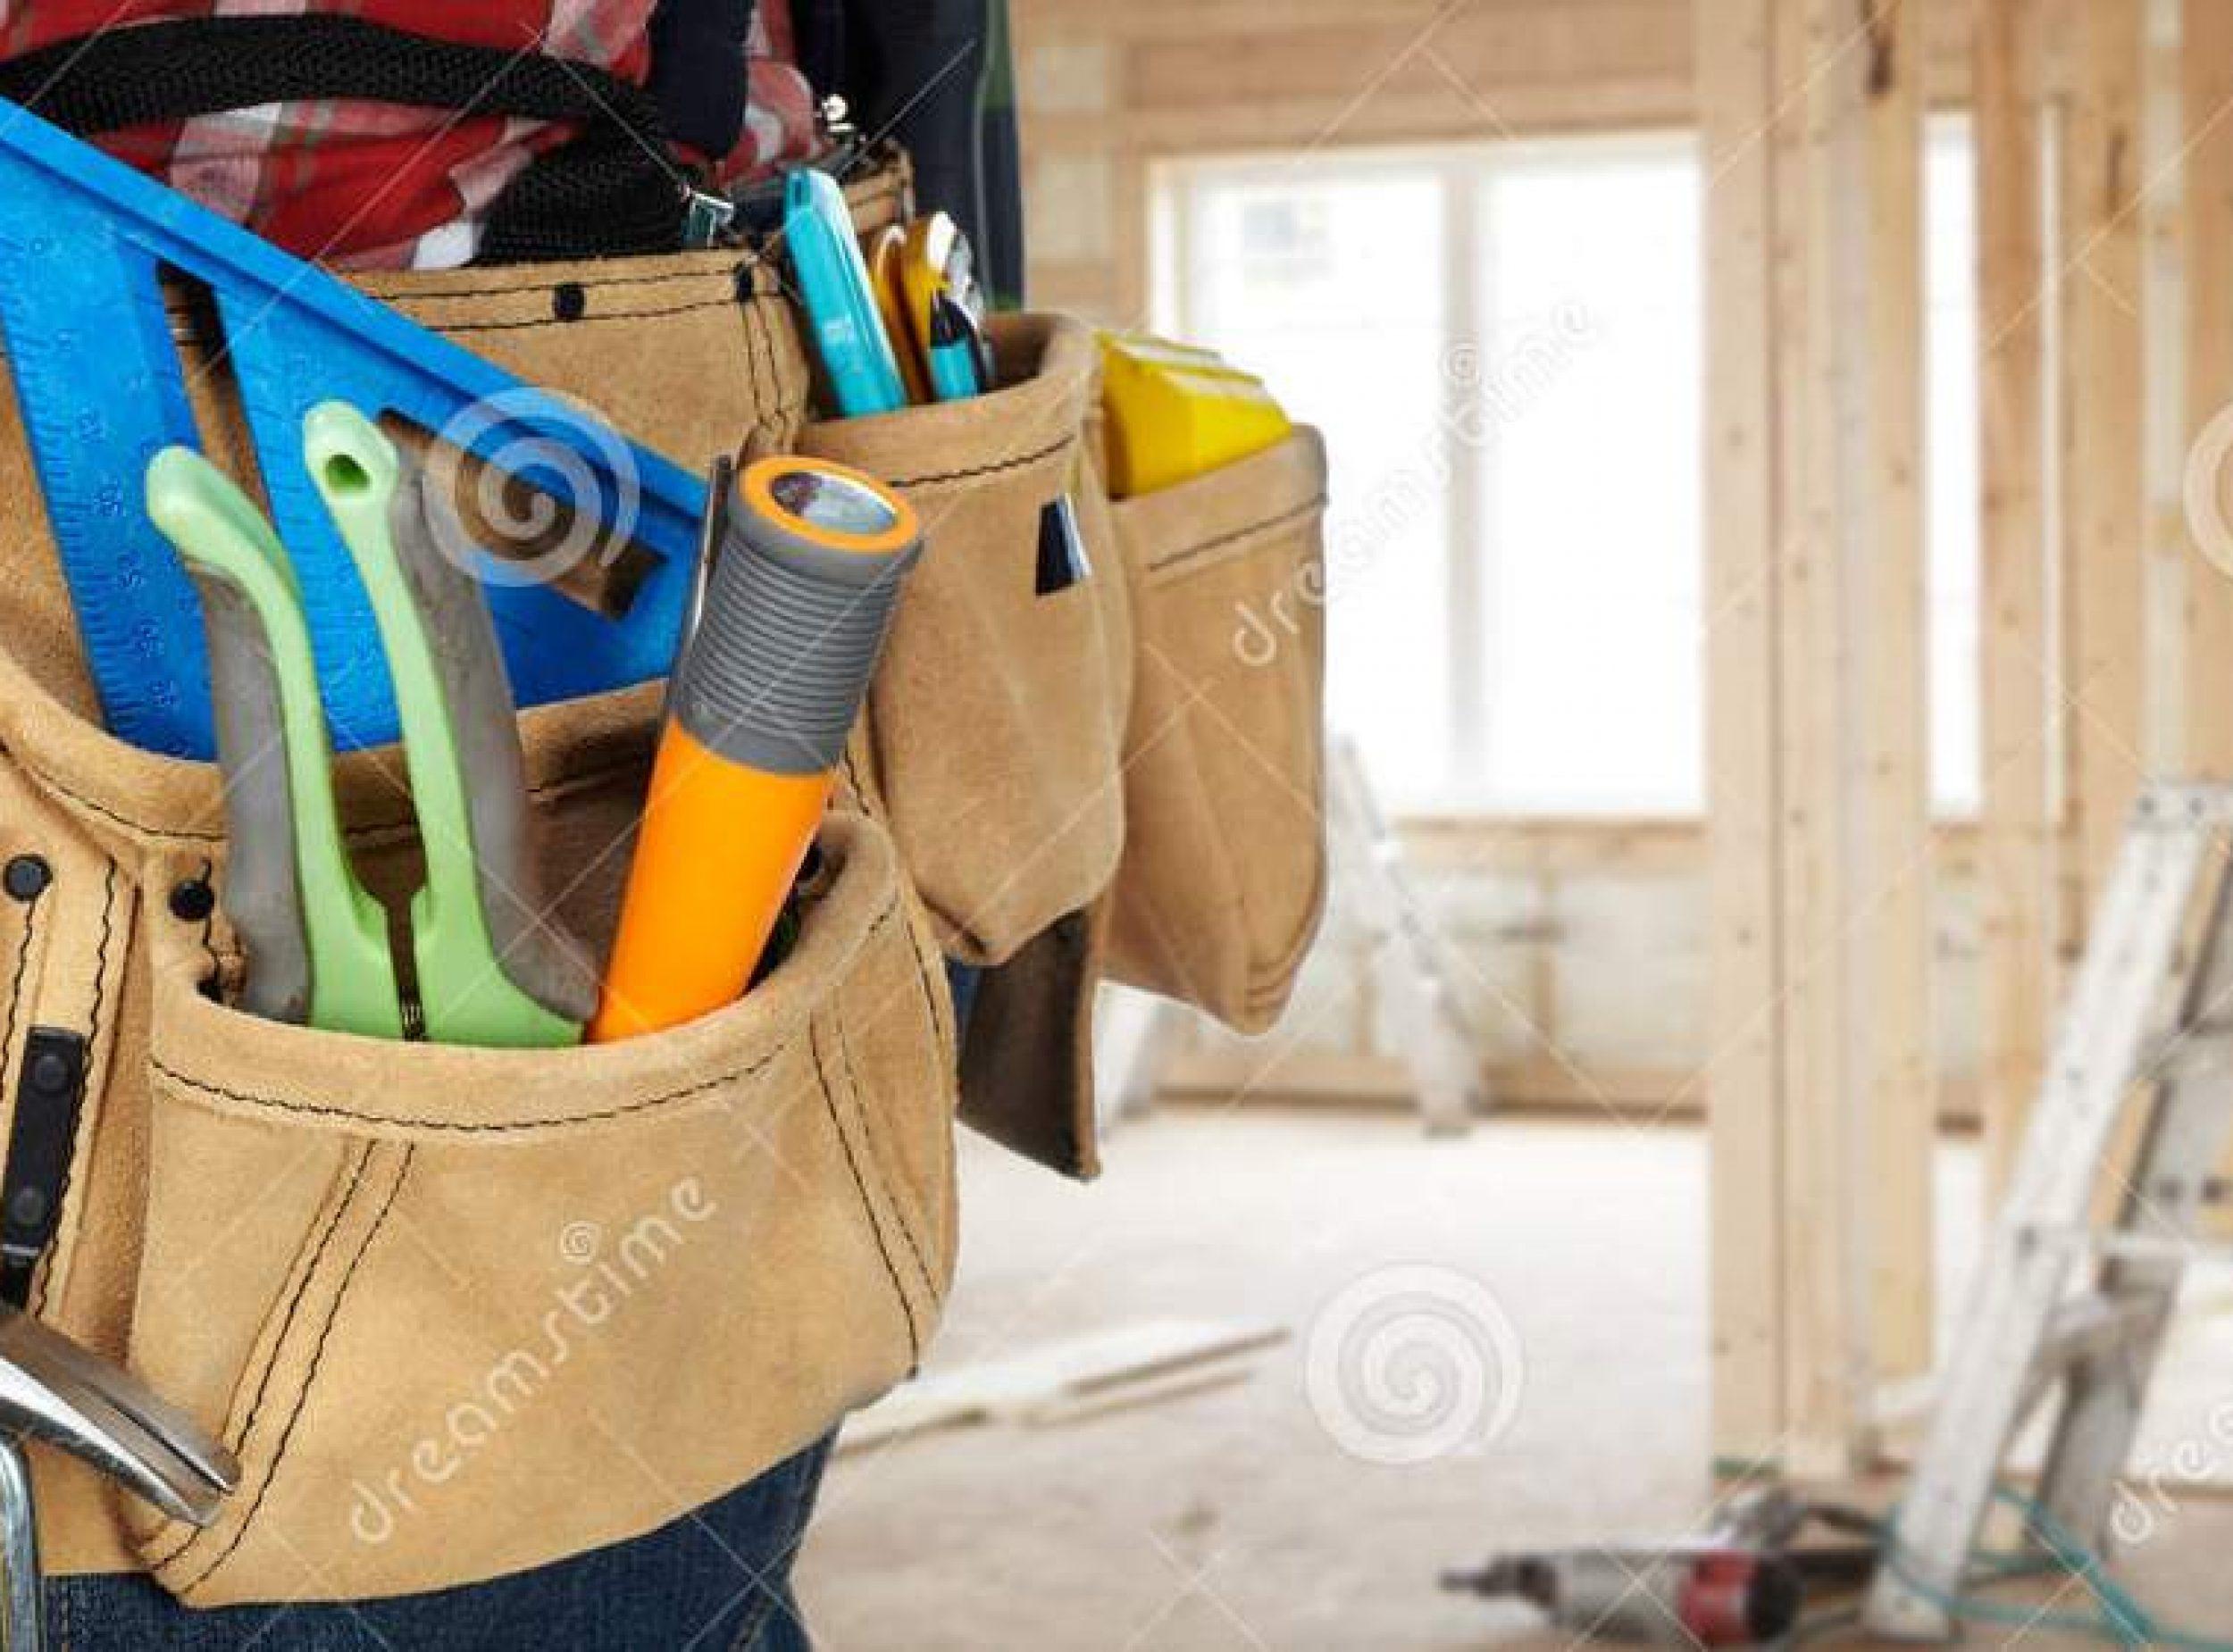 http://www.dreamstime.com/stock-photo-tool-belt-construction-tools-builder-handyman-renovation-background-image80689580